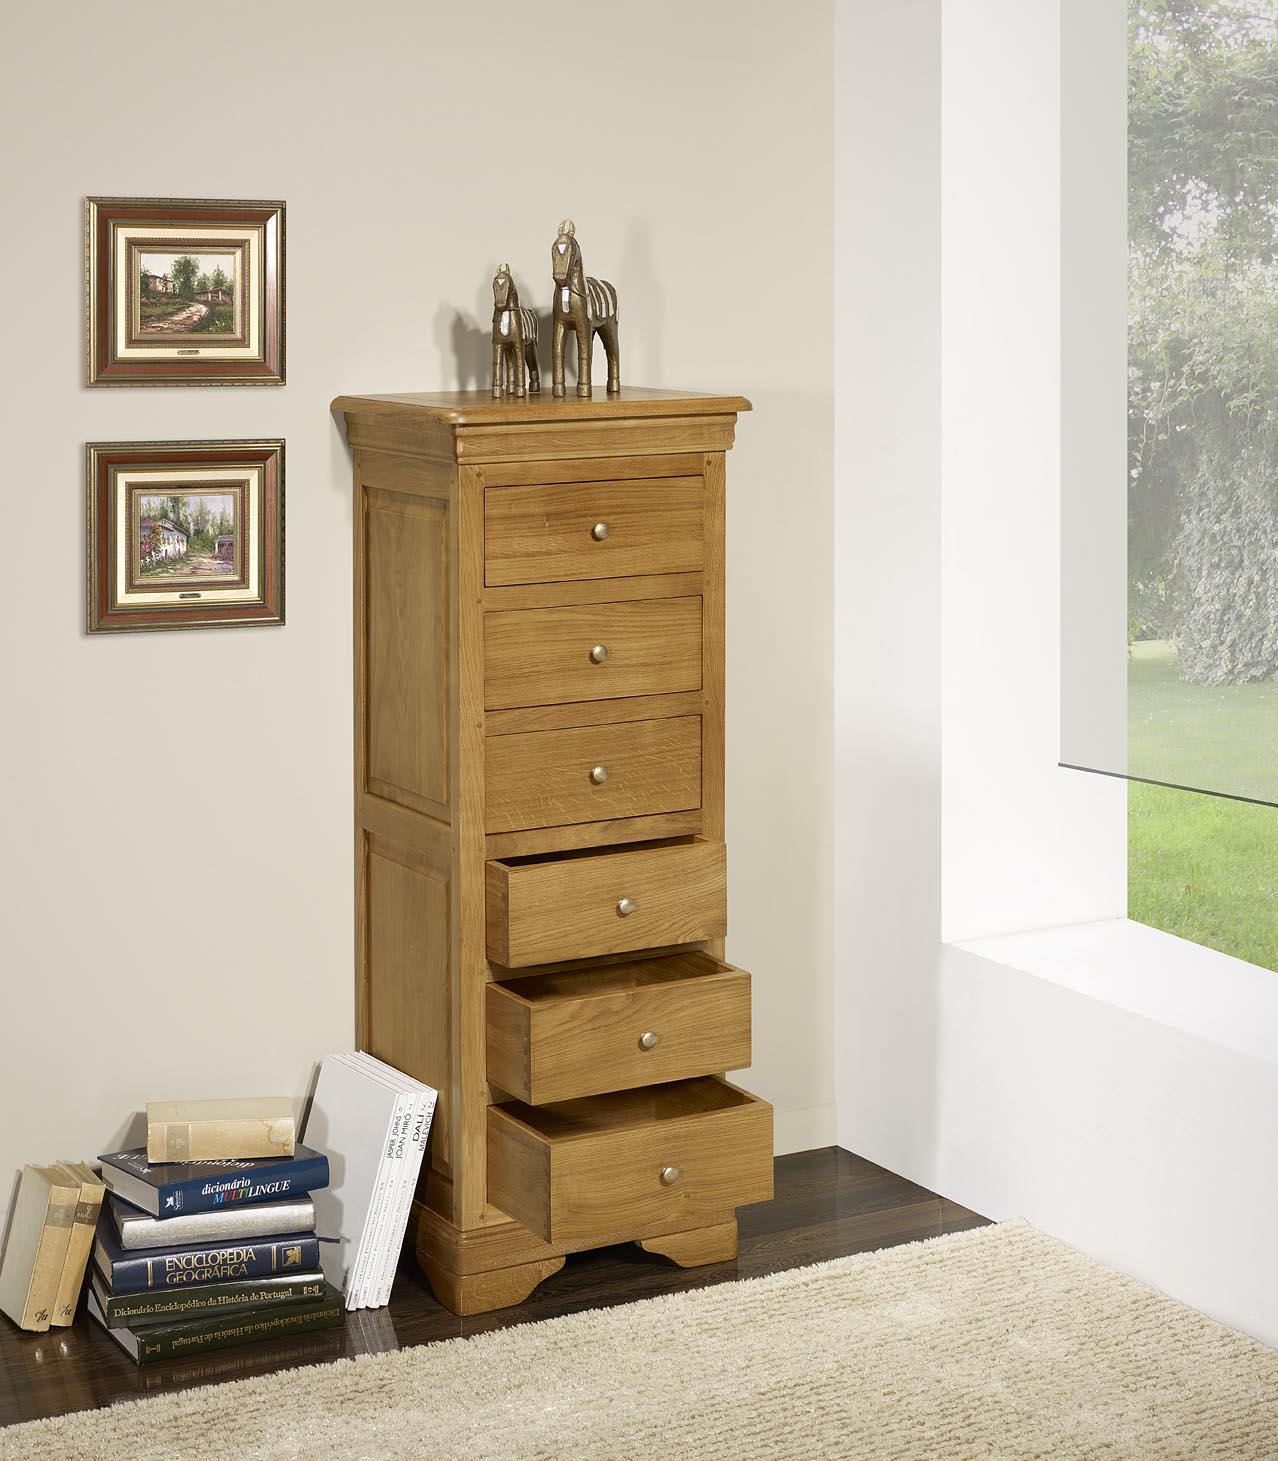 chiffonnier 6 tiroirs benjamin en ch ne massif de style louis philippe meuble en ch ne massif. Black Bedroom Furniture Sets. Home Design Ideas